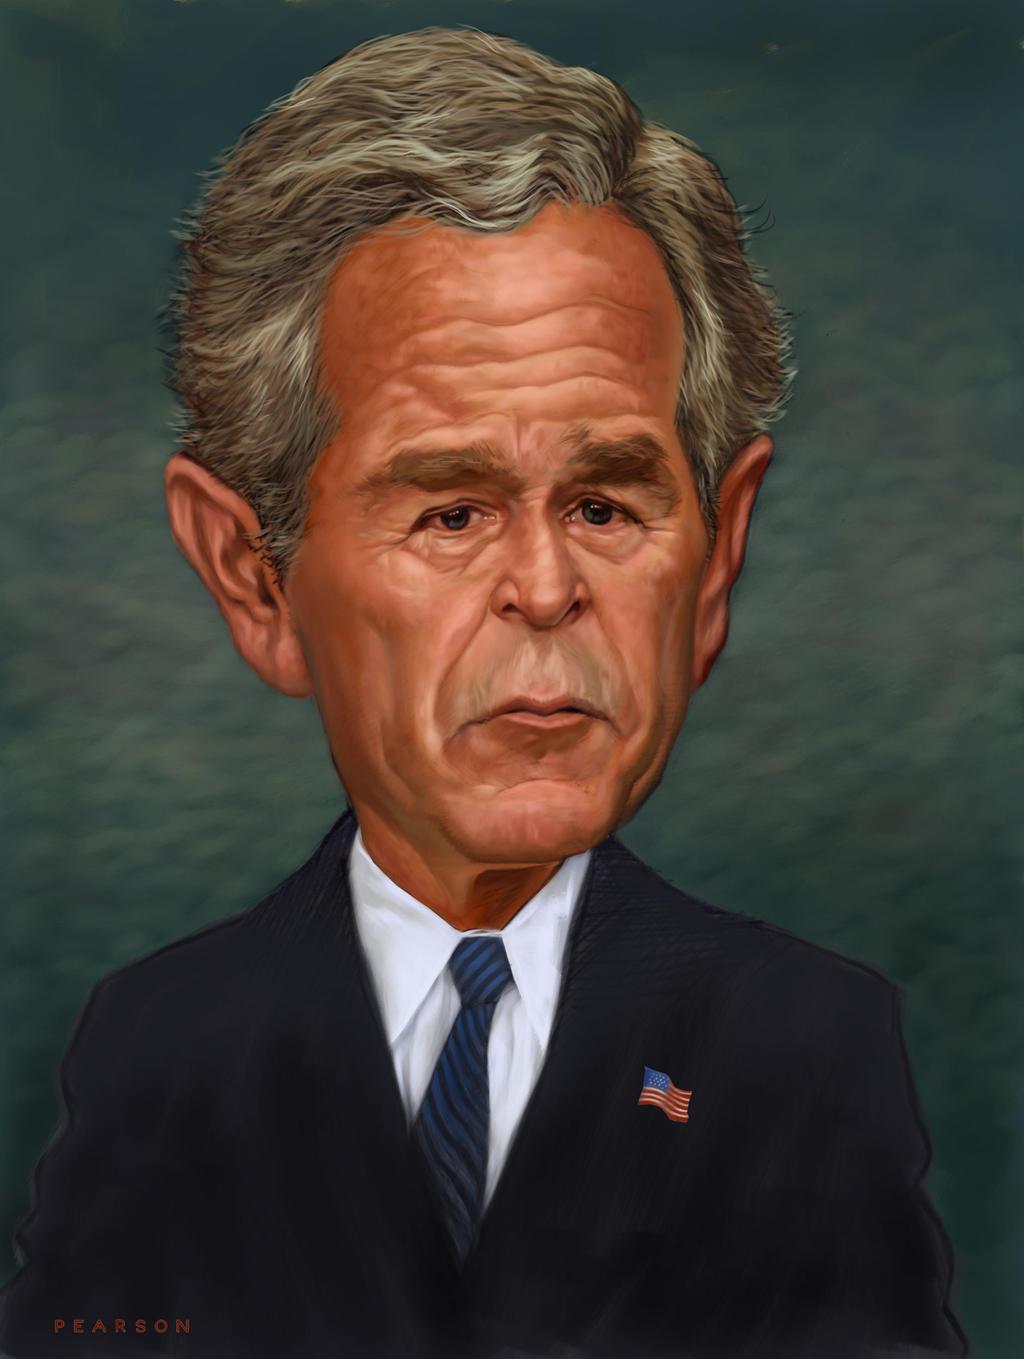 George Bush: Bad President